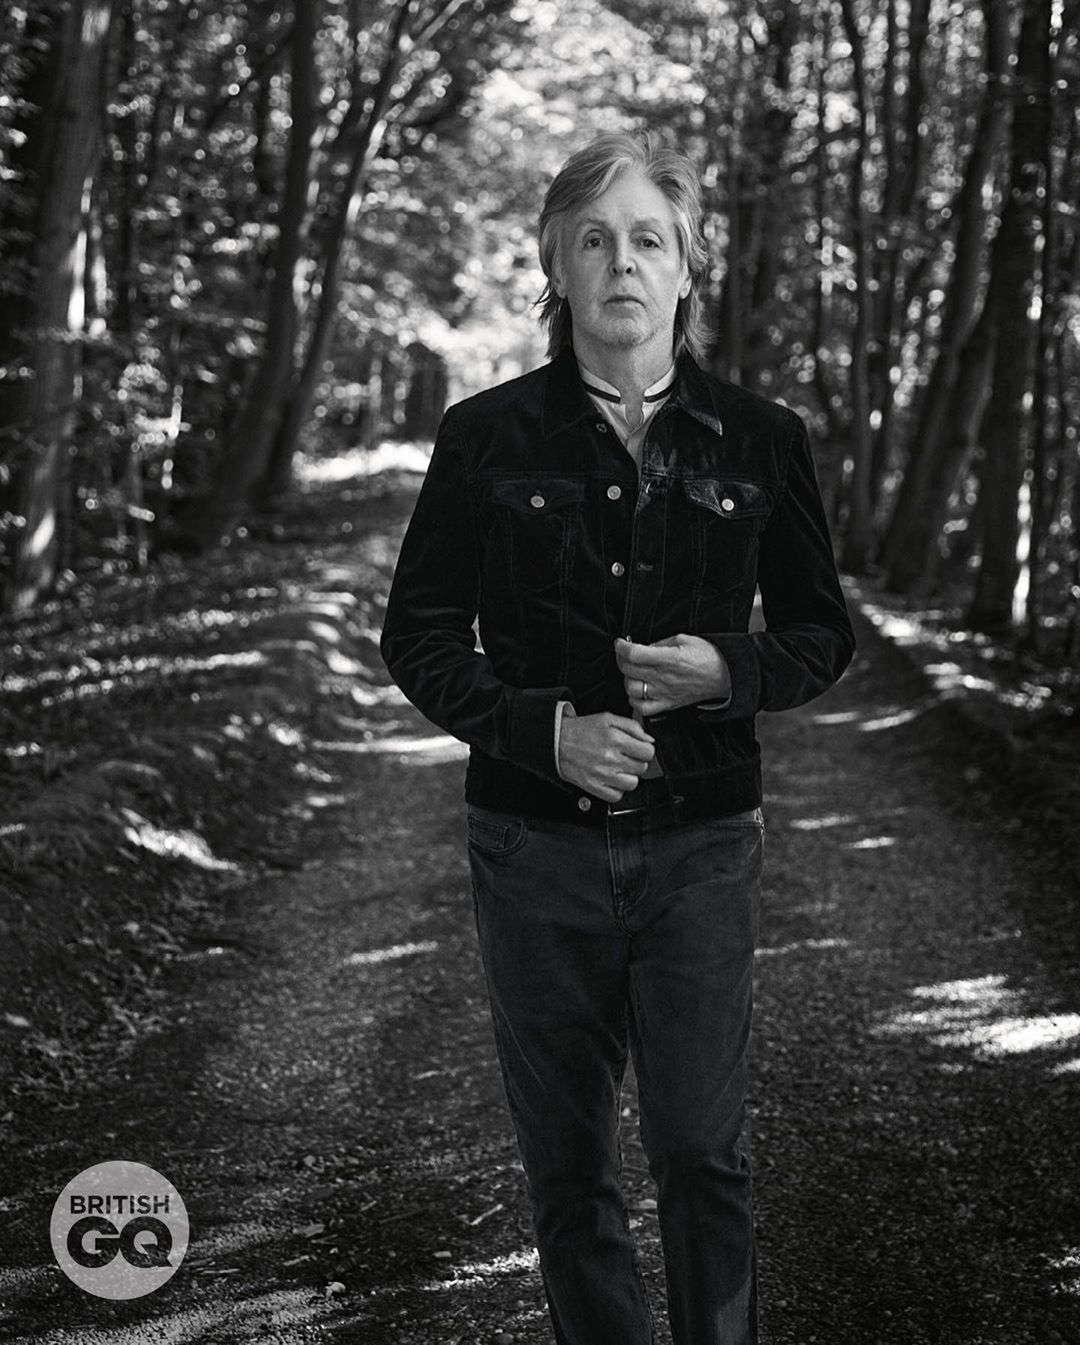 paul-mccartney-covers-british-gq-september-2020-magazine-04